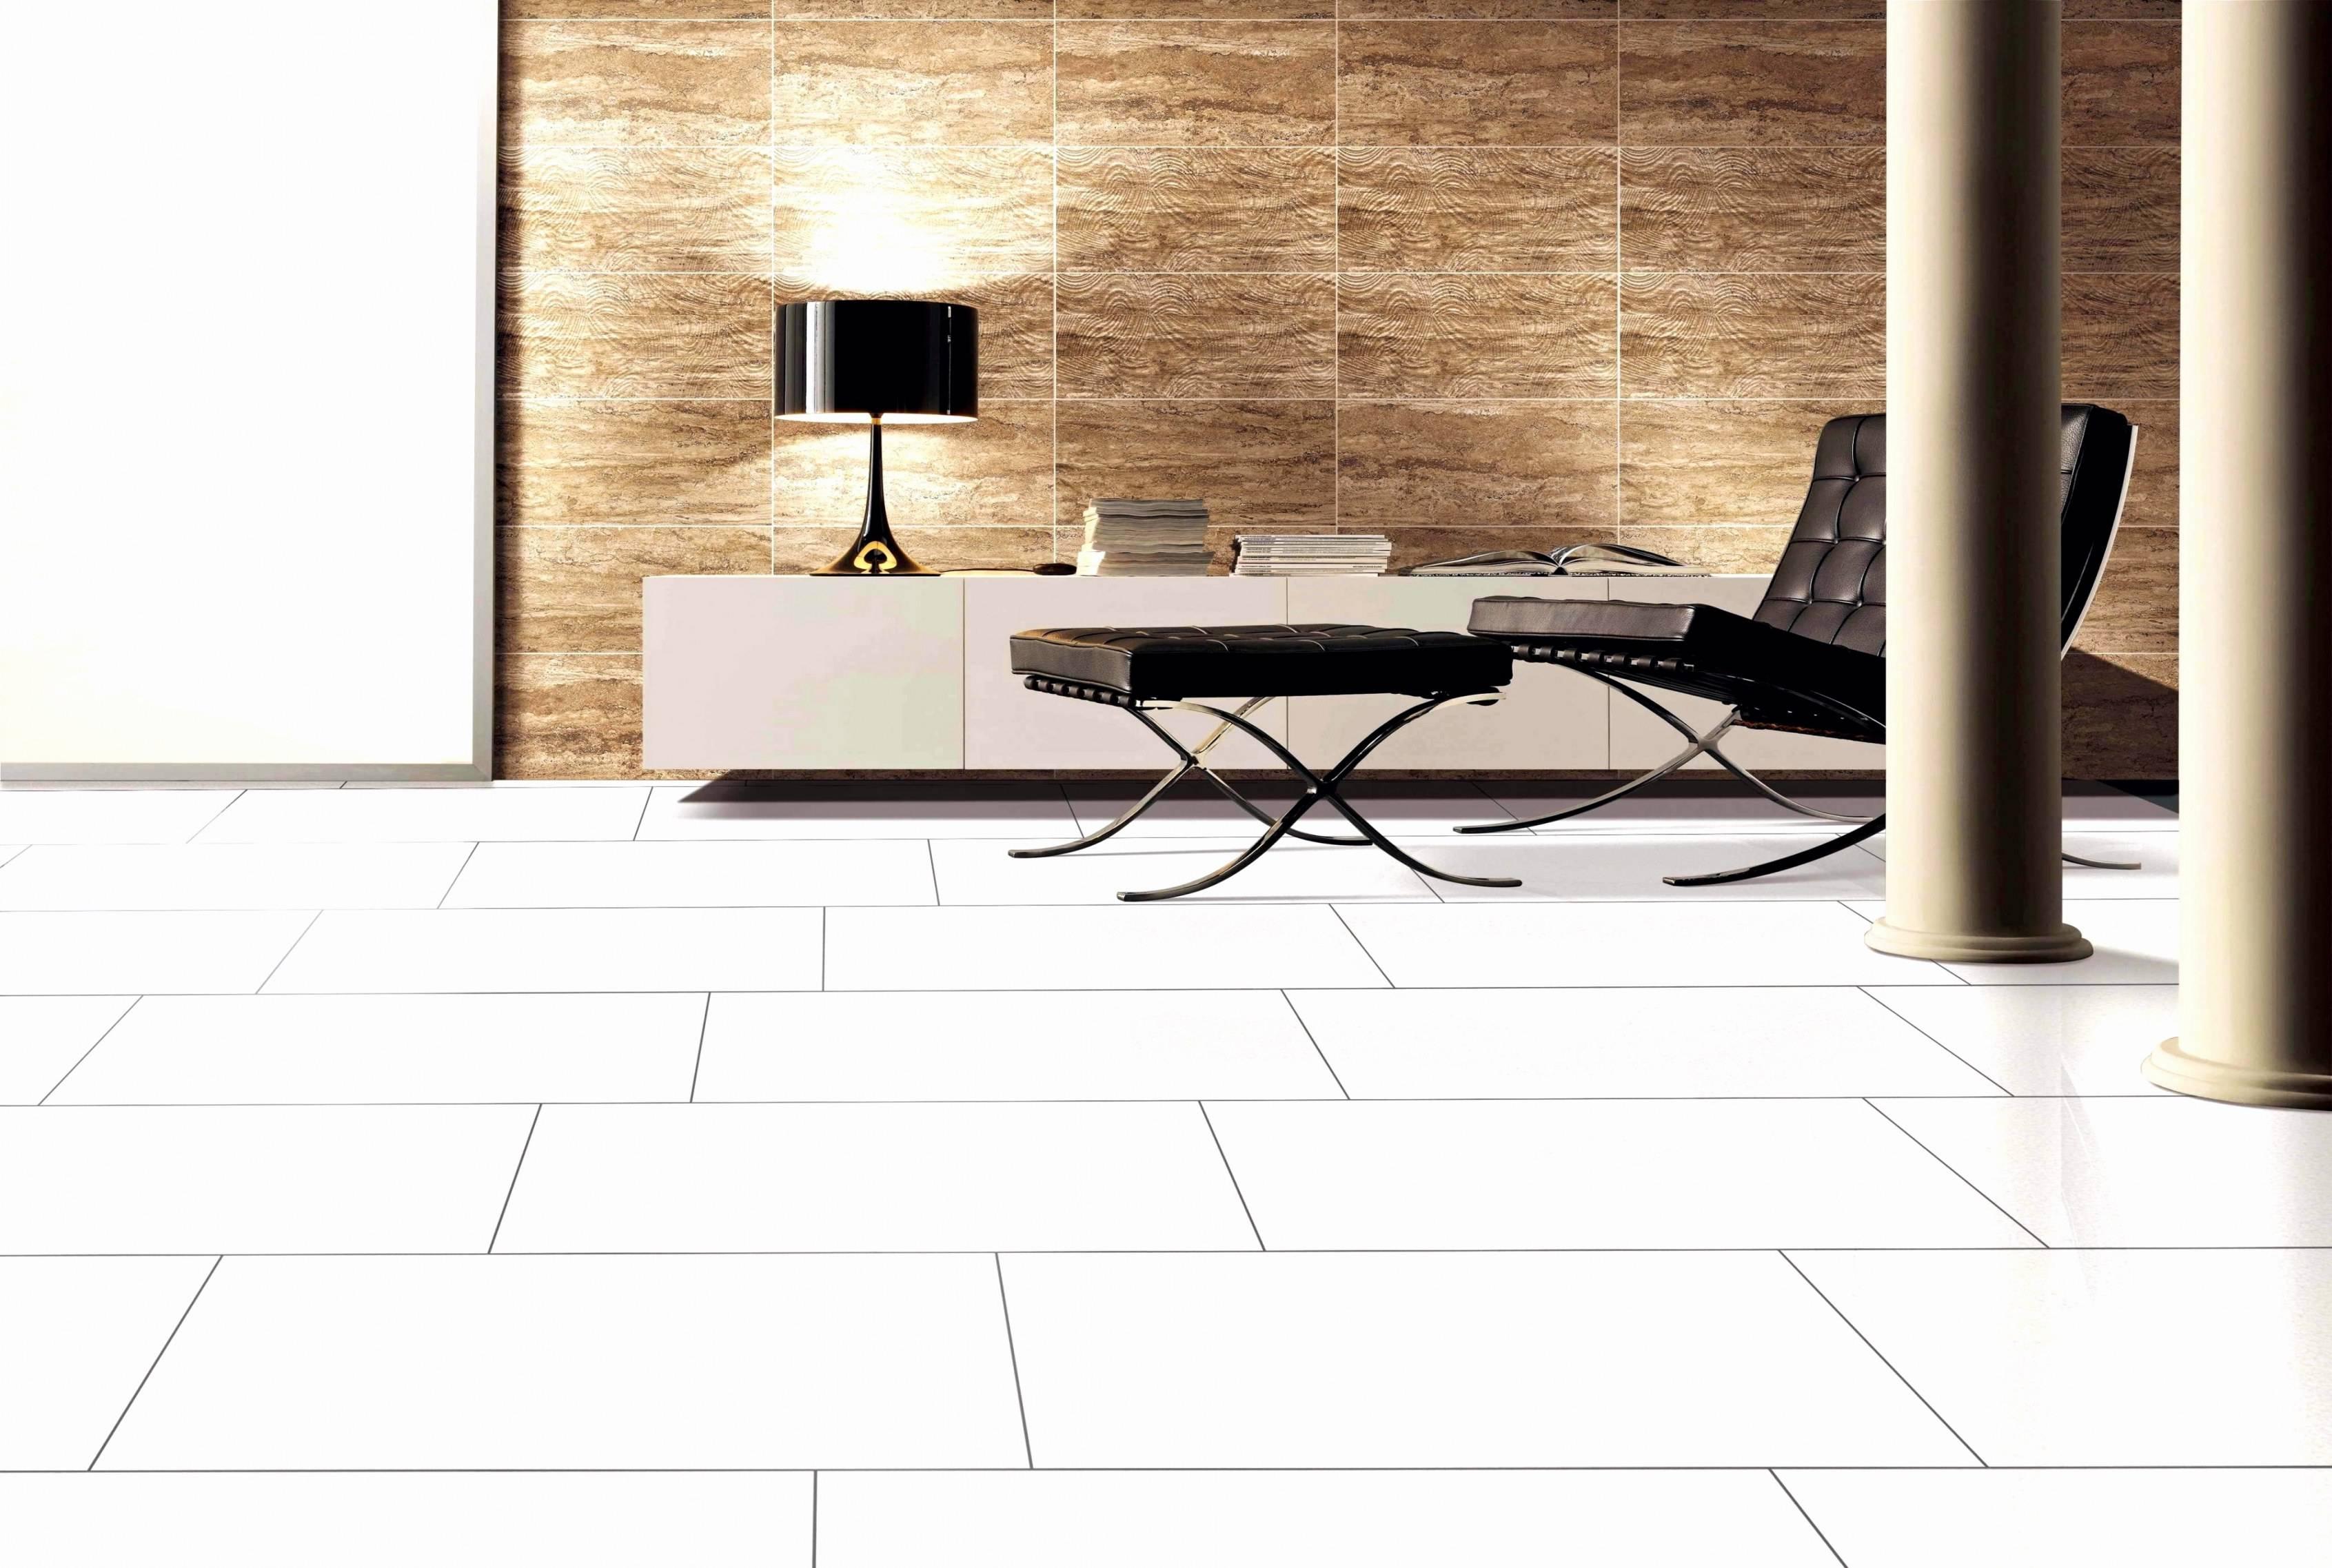 bathroom tiles designs 47 luxury tile colors for kitchen floor of bathroom tiles designs